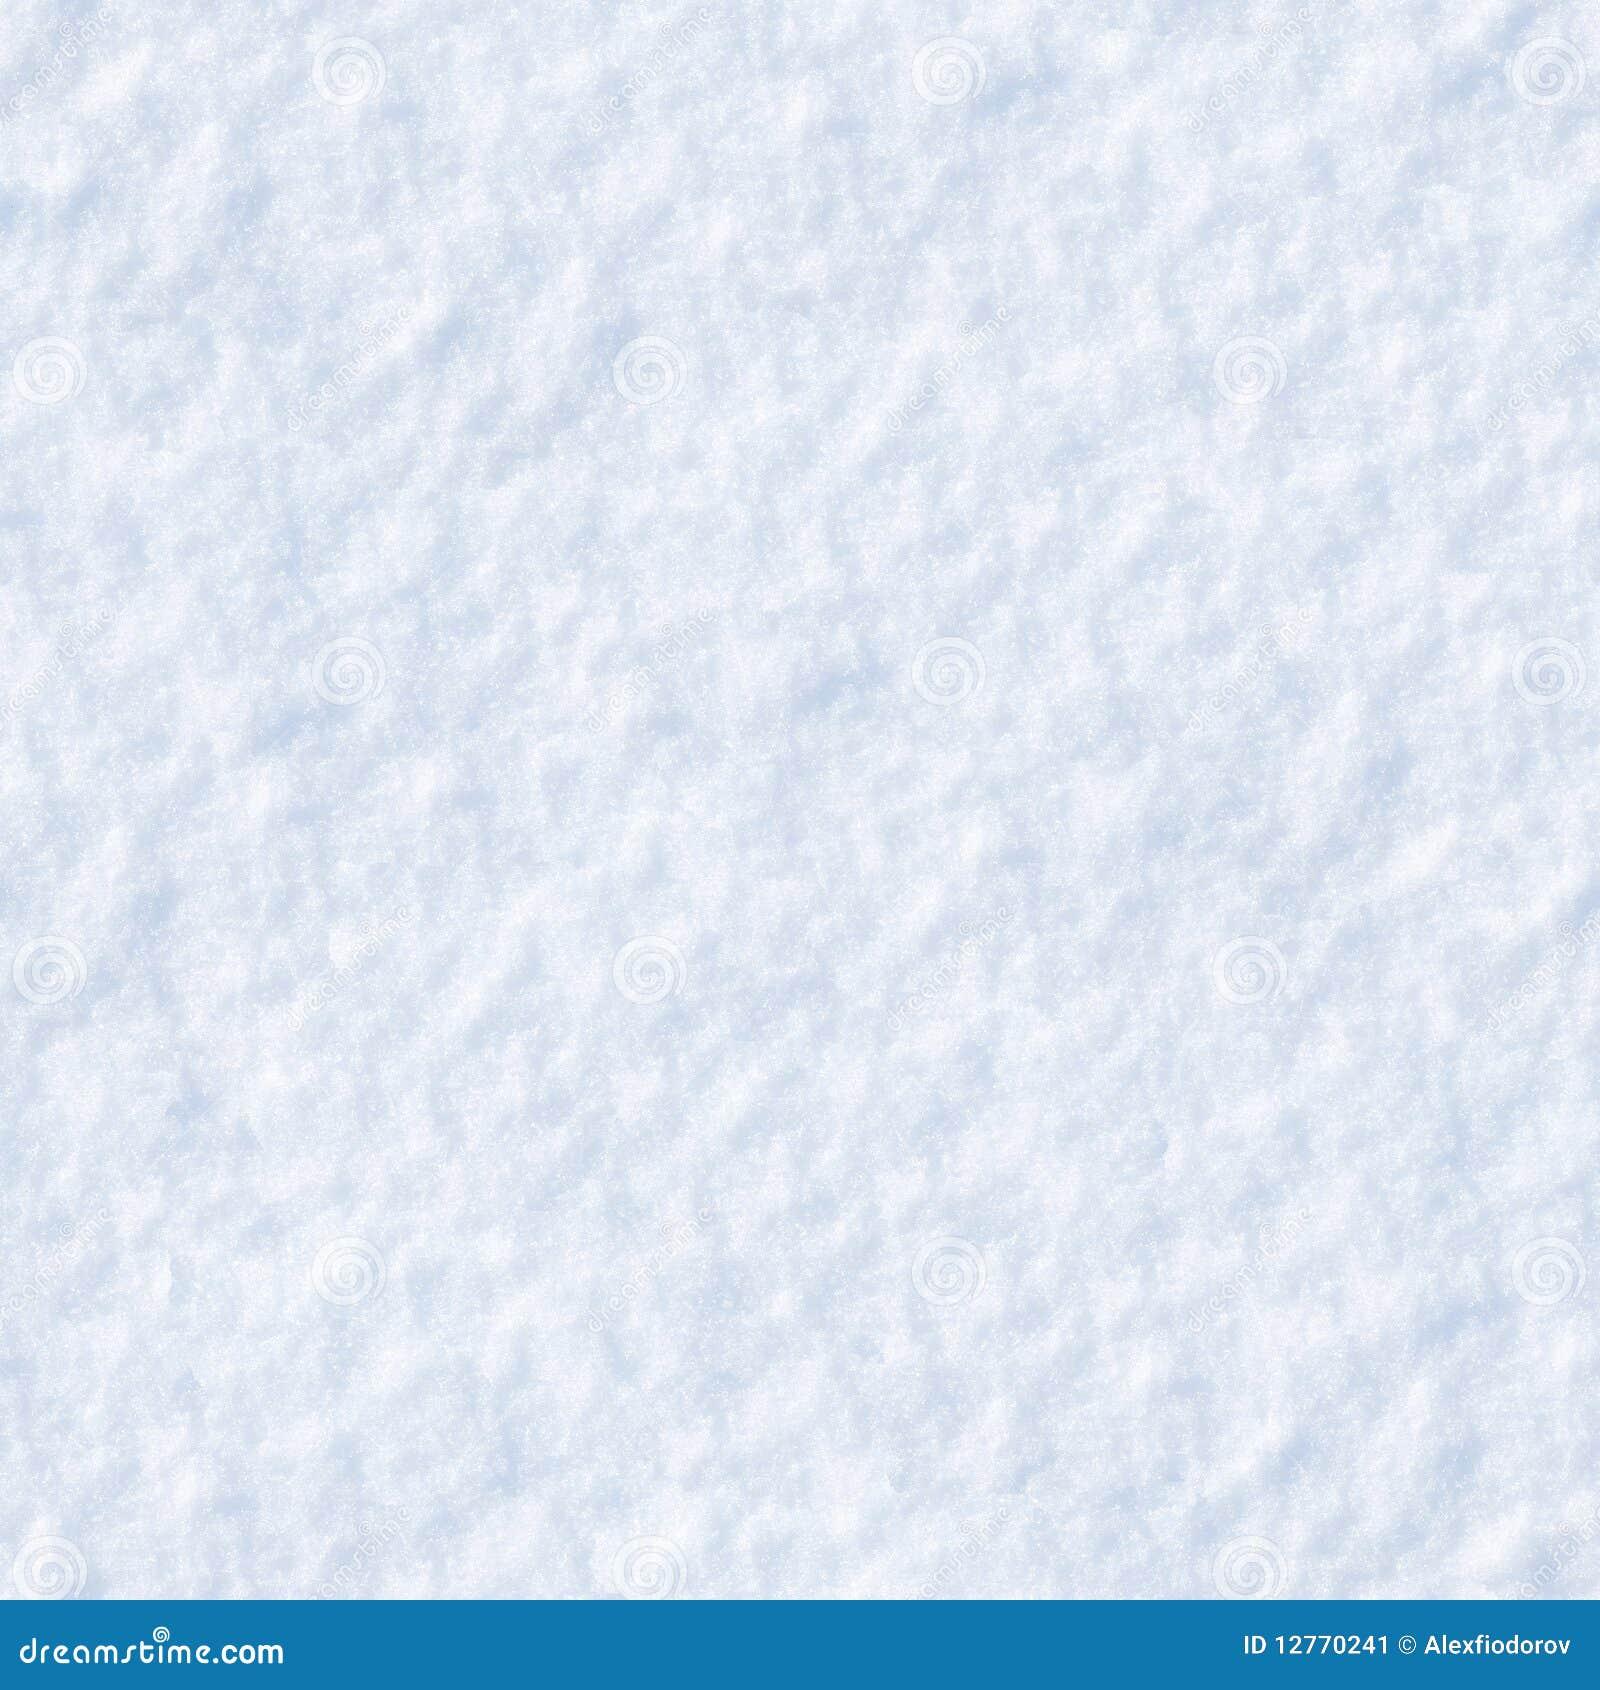 Snow seamless background.